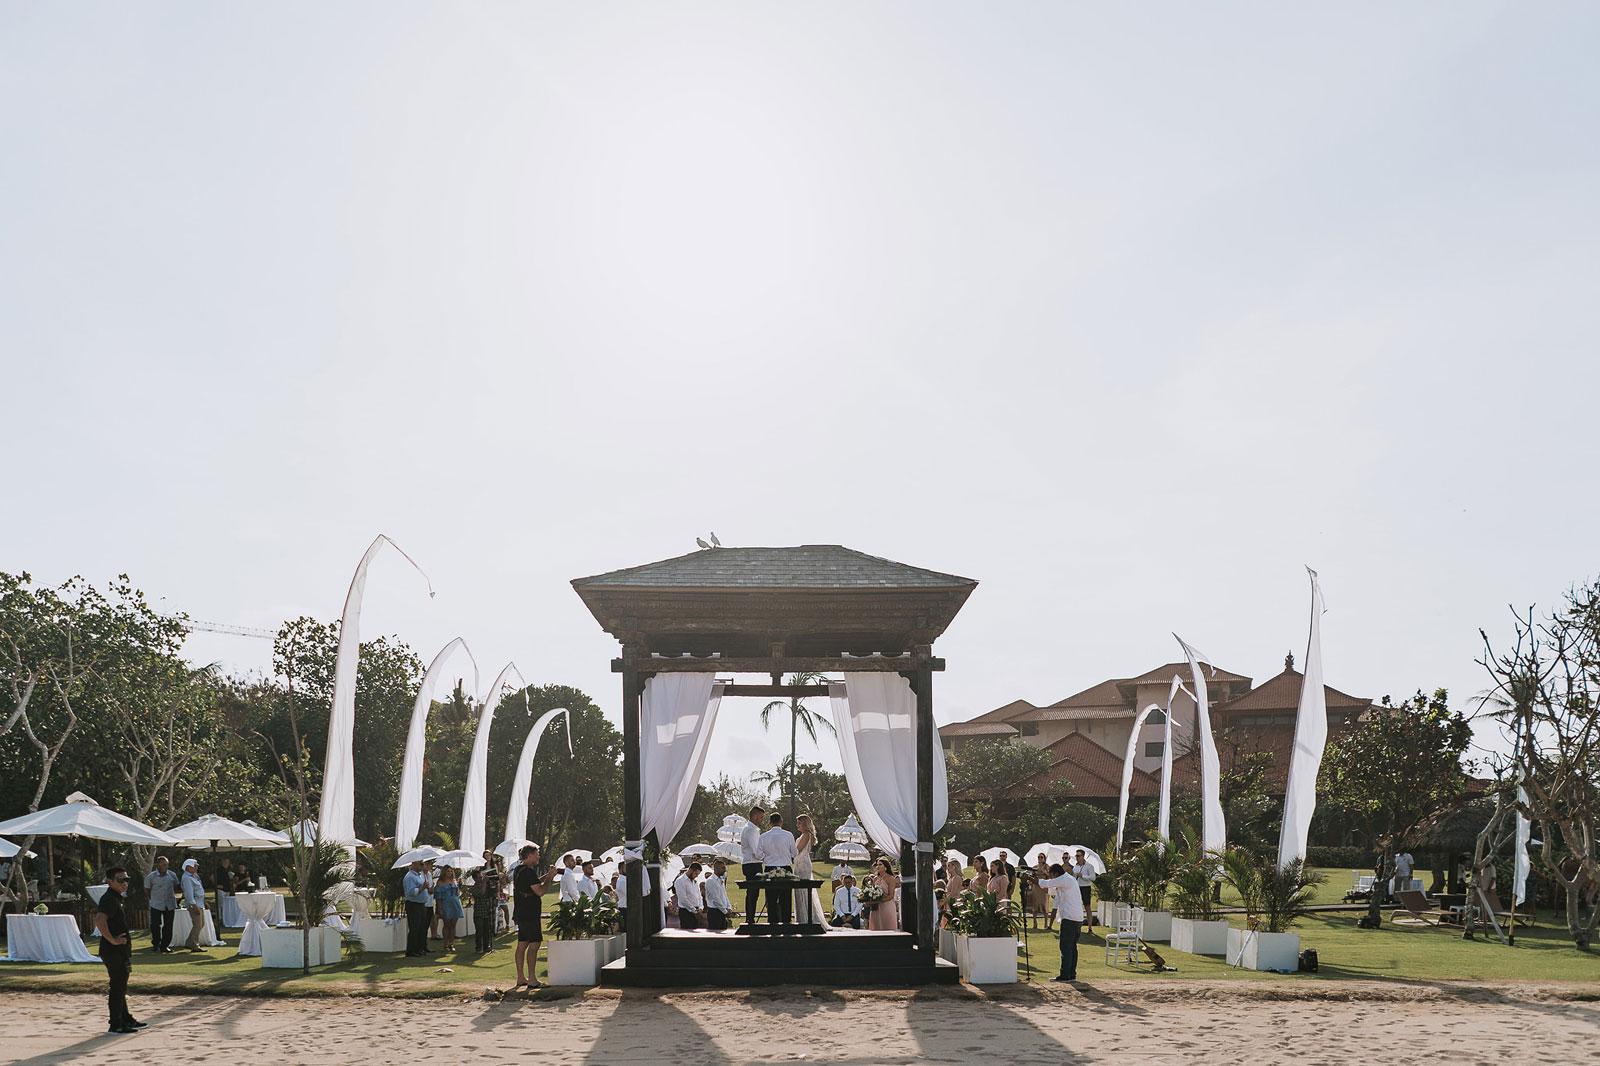 newfound-j-j-bali-nusa-dua-wedding-wedding-photographer-045-a